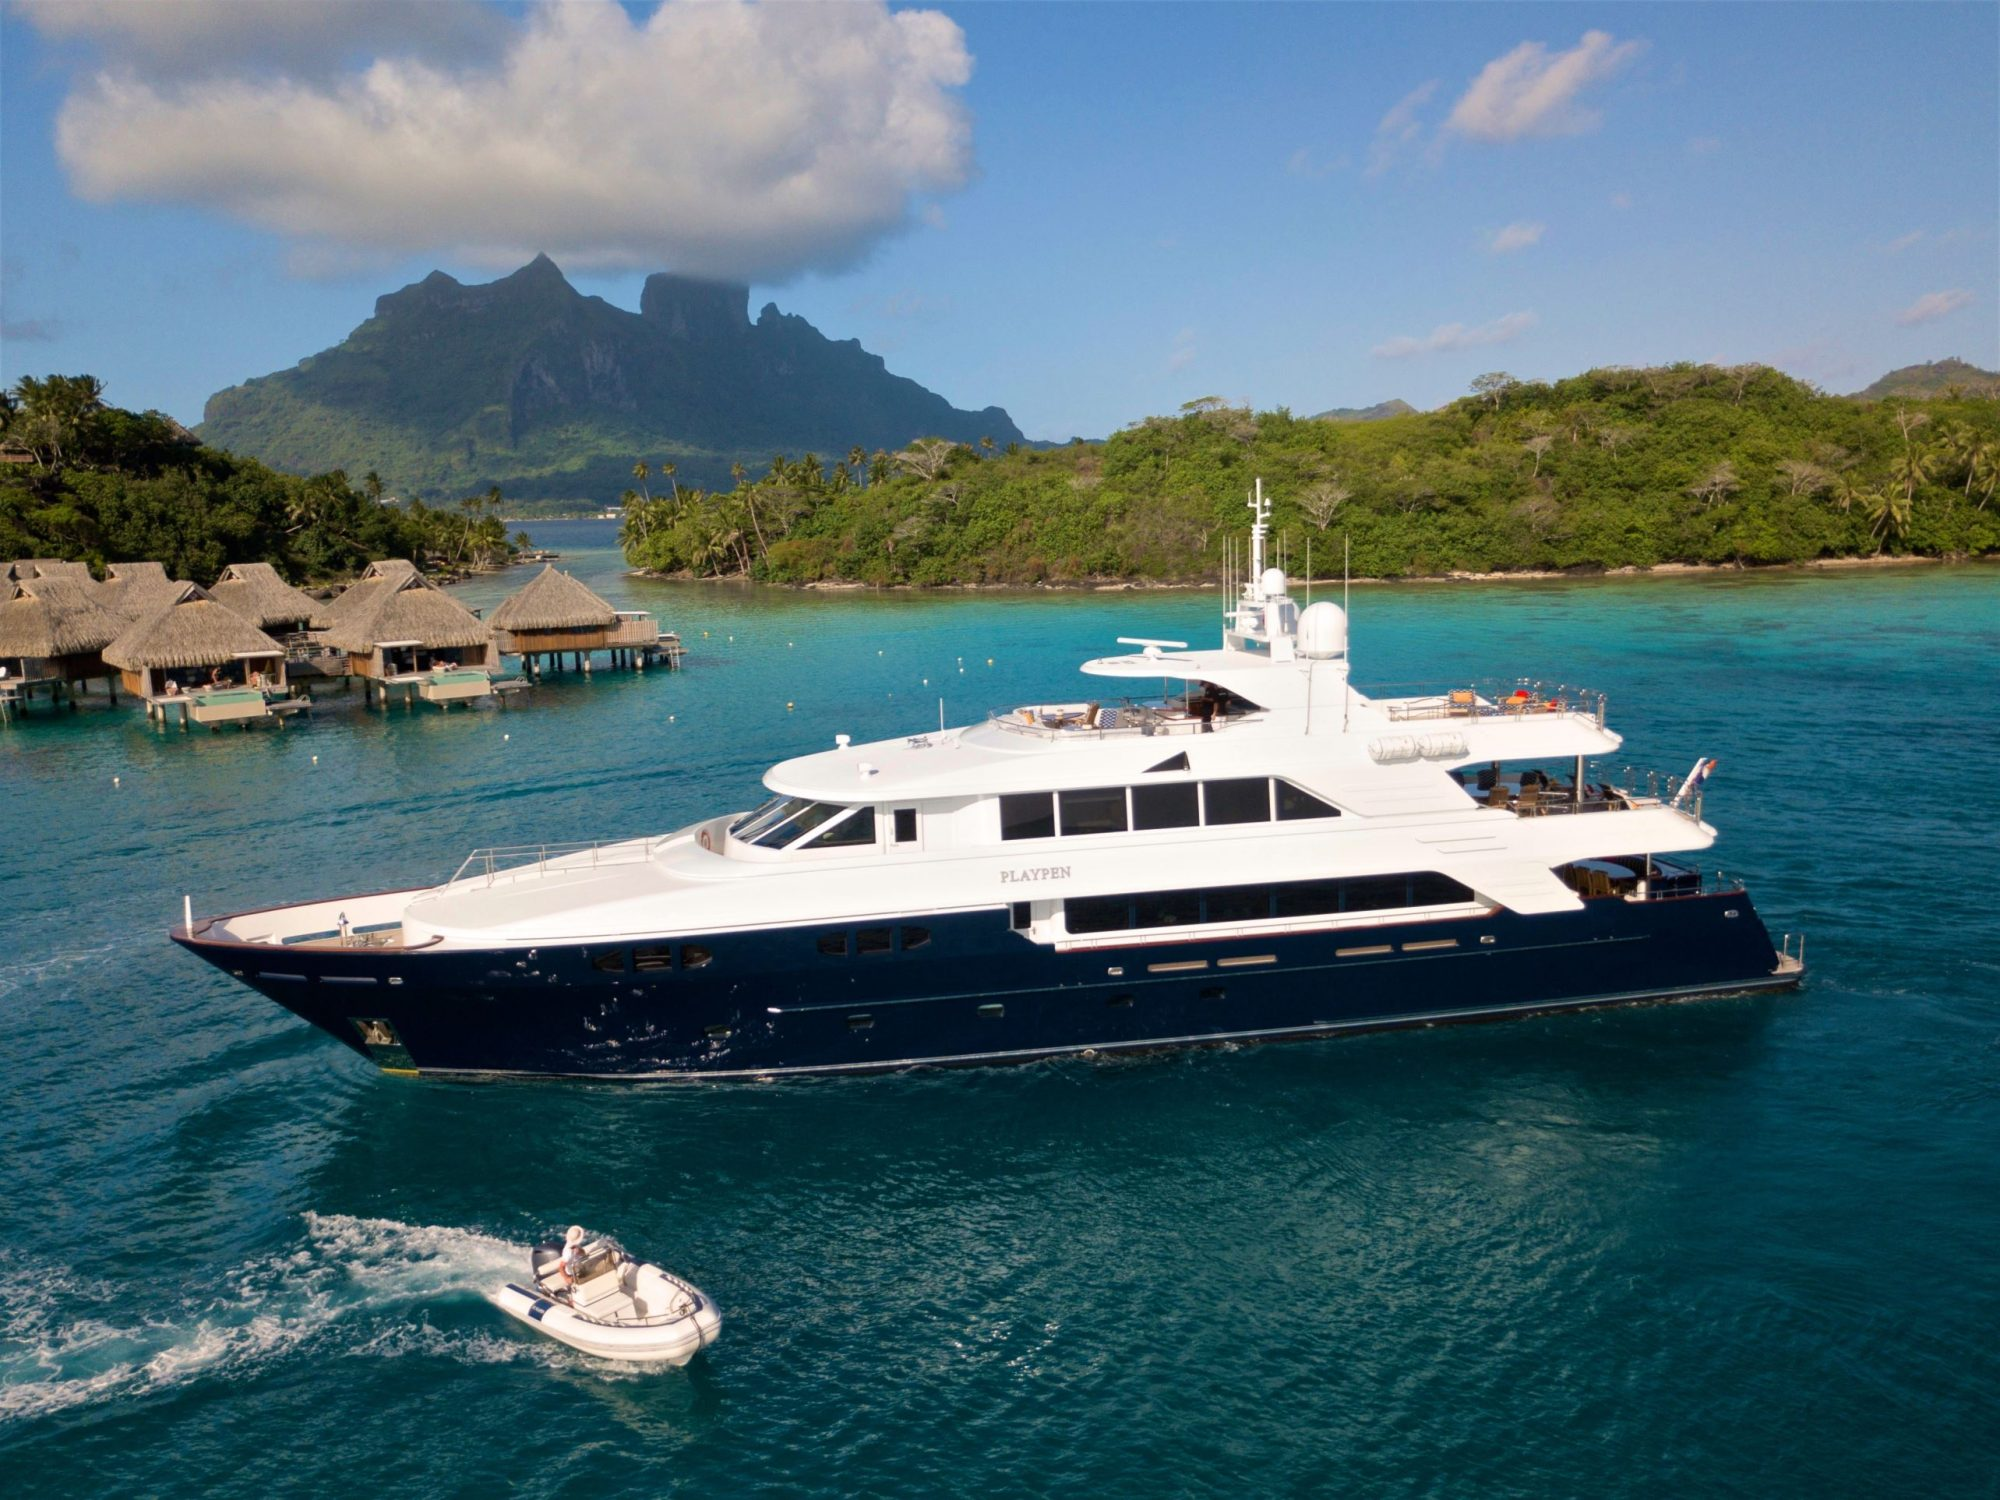 Motor Yacht PLAYPEN for Charter with SuperYachtsMonaco